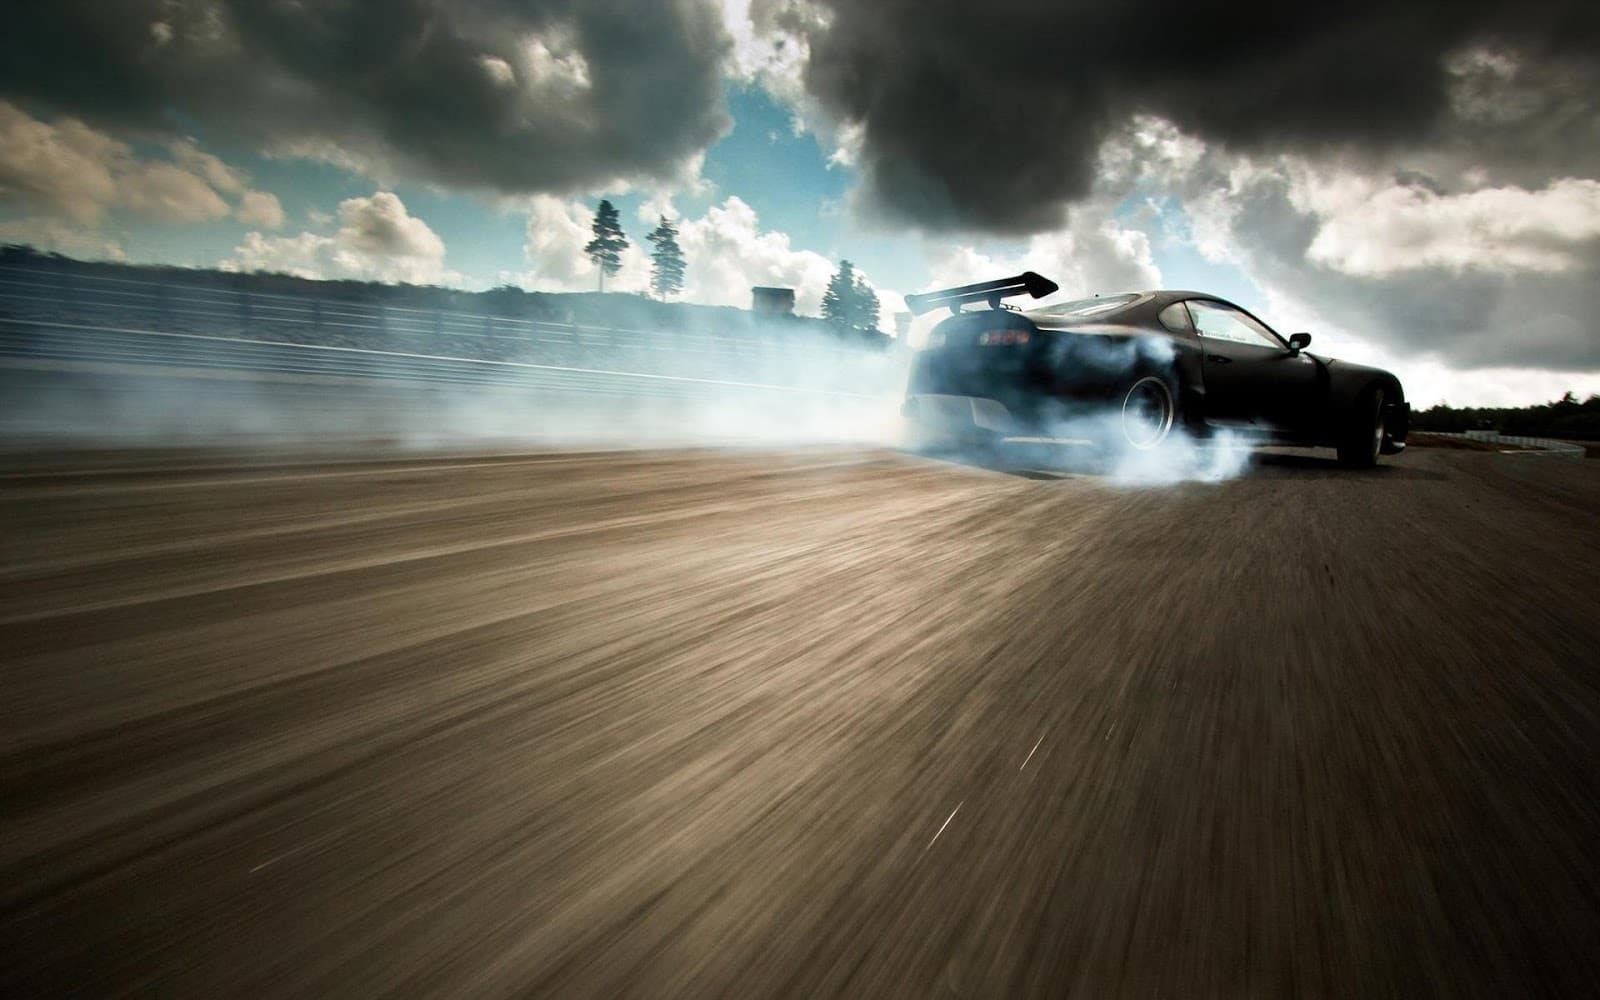 supra Οι drifters με τις Supra δημιουργούν τα σύννεφα drift, Drifter, Toyota, Toyota Supra, videos